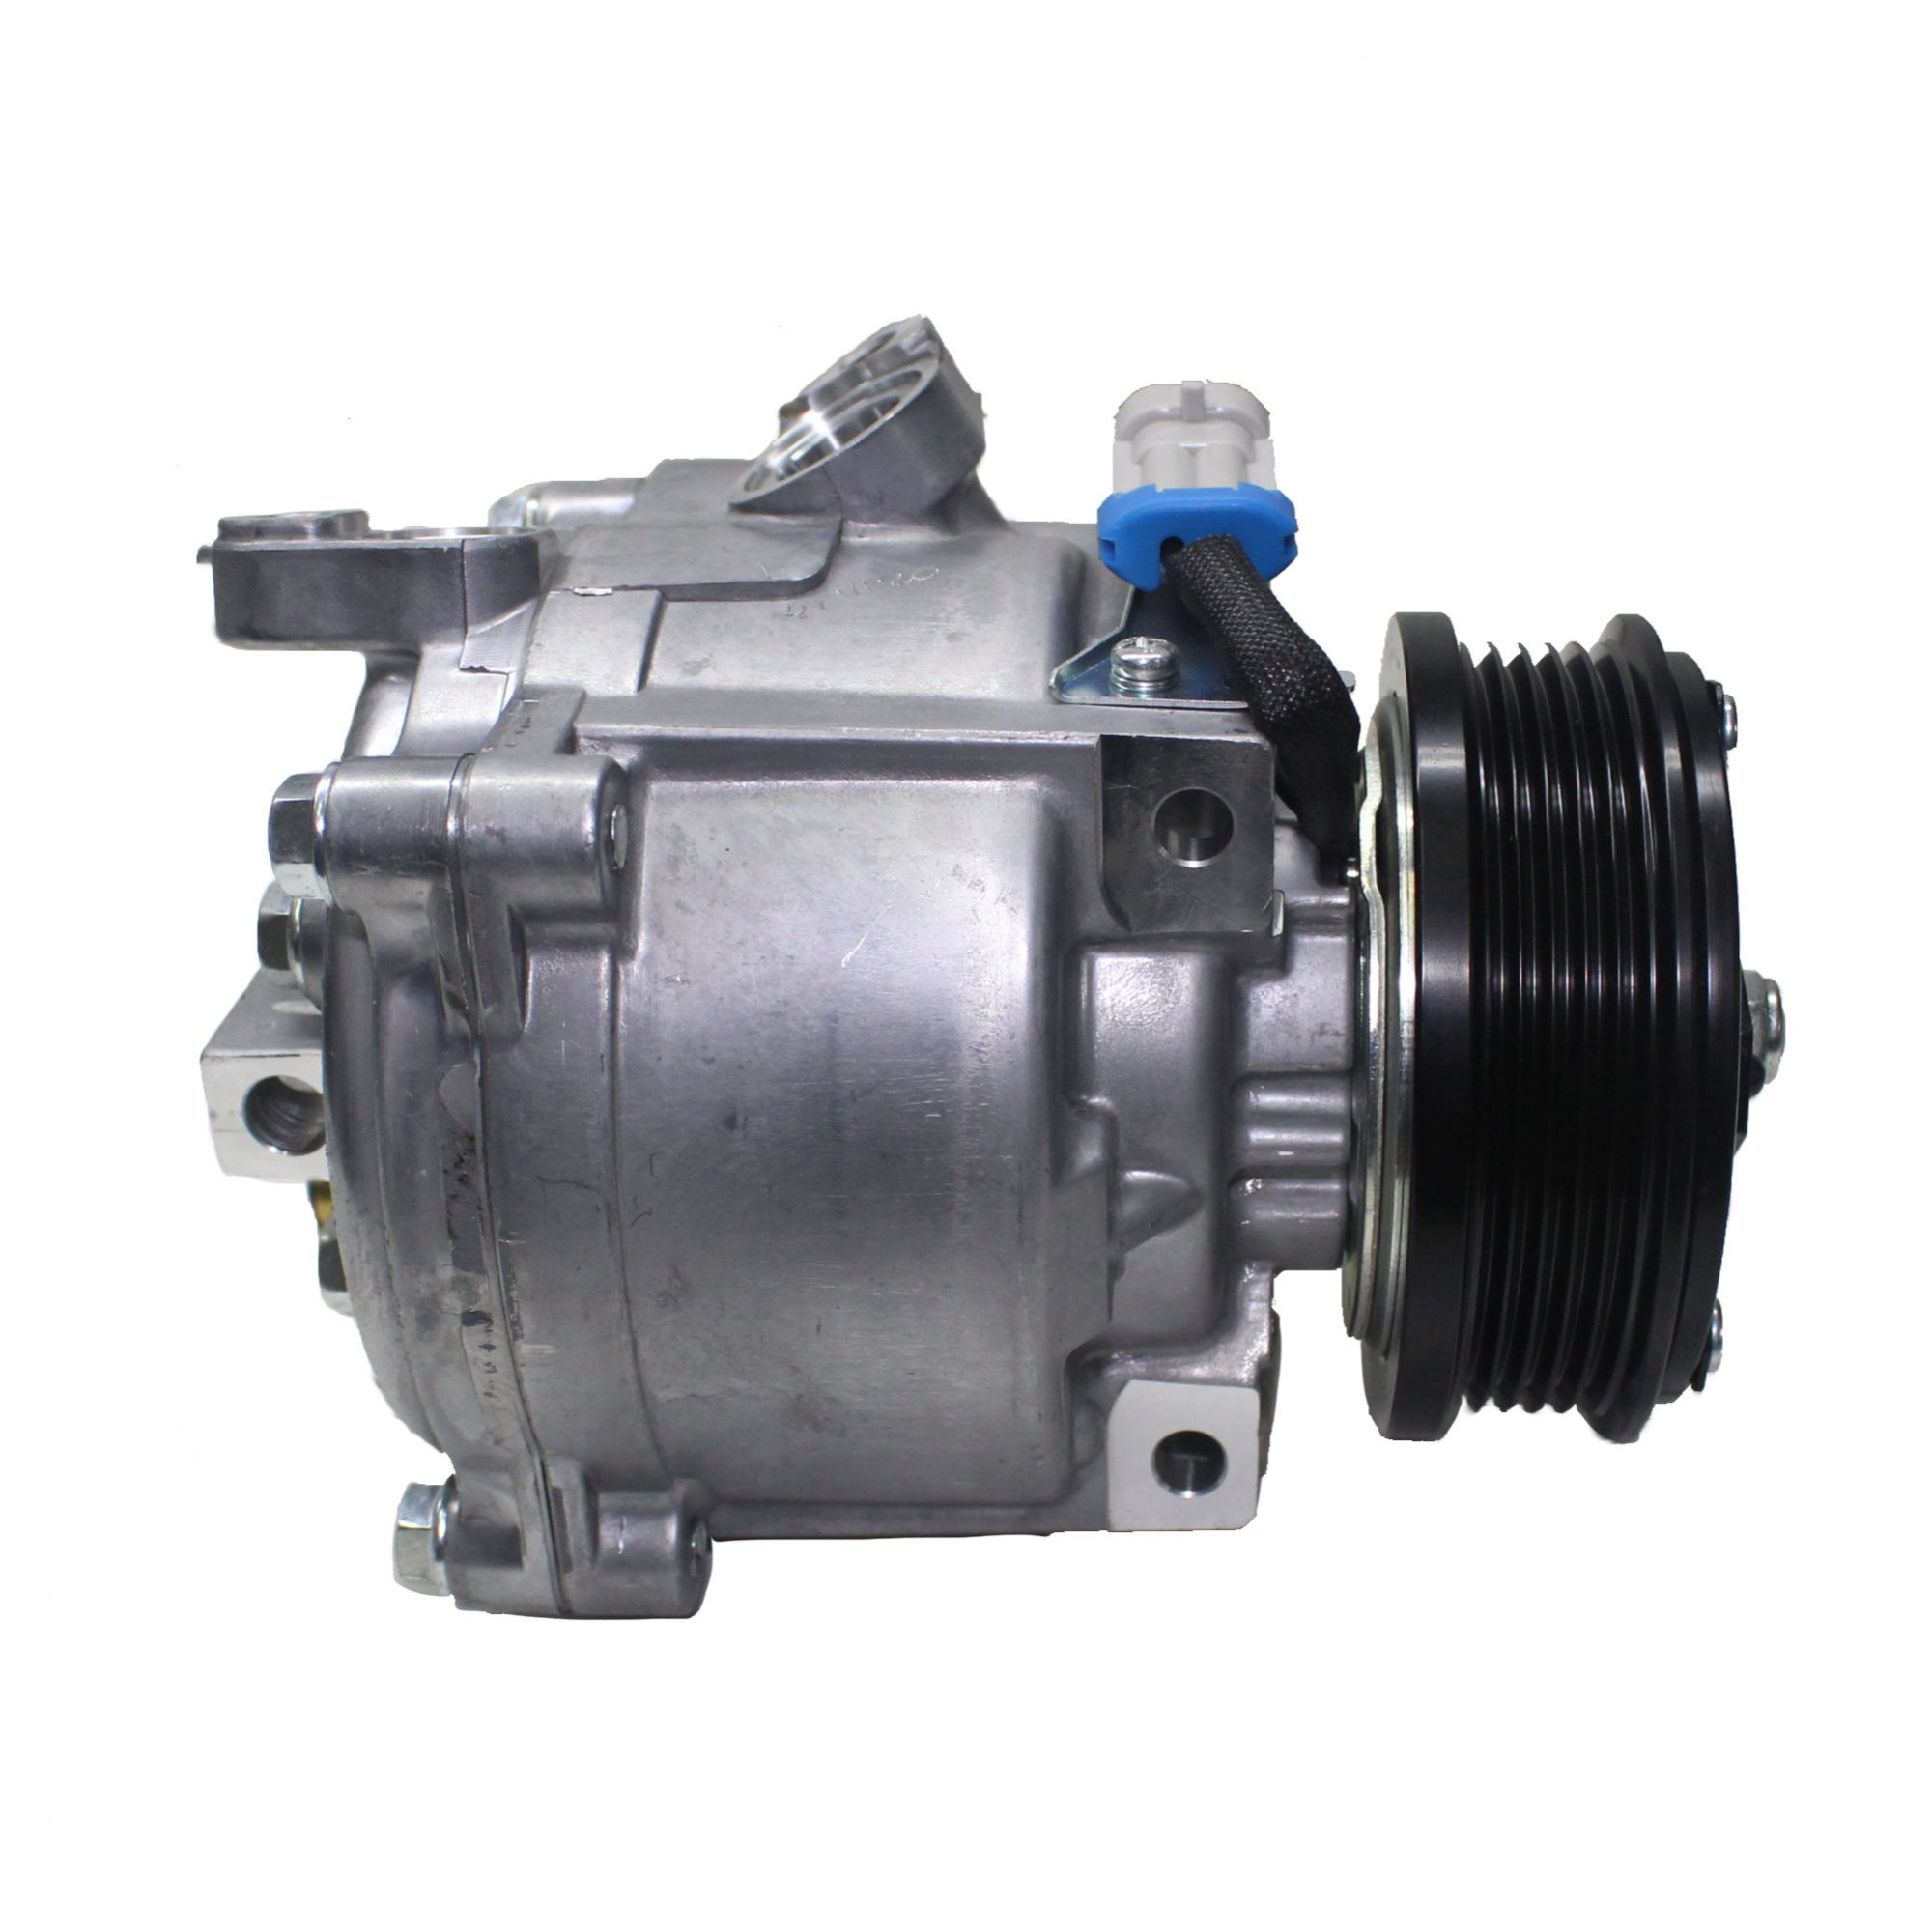 Compressor Ar Condicionado Onix, Prisma, Spin, Sonic, Cobalt